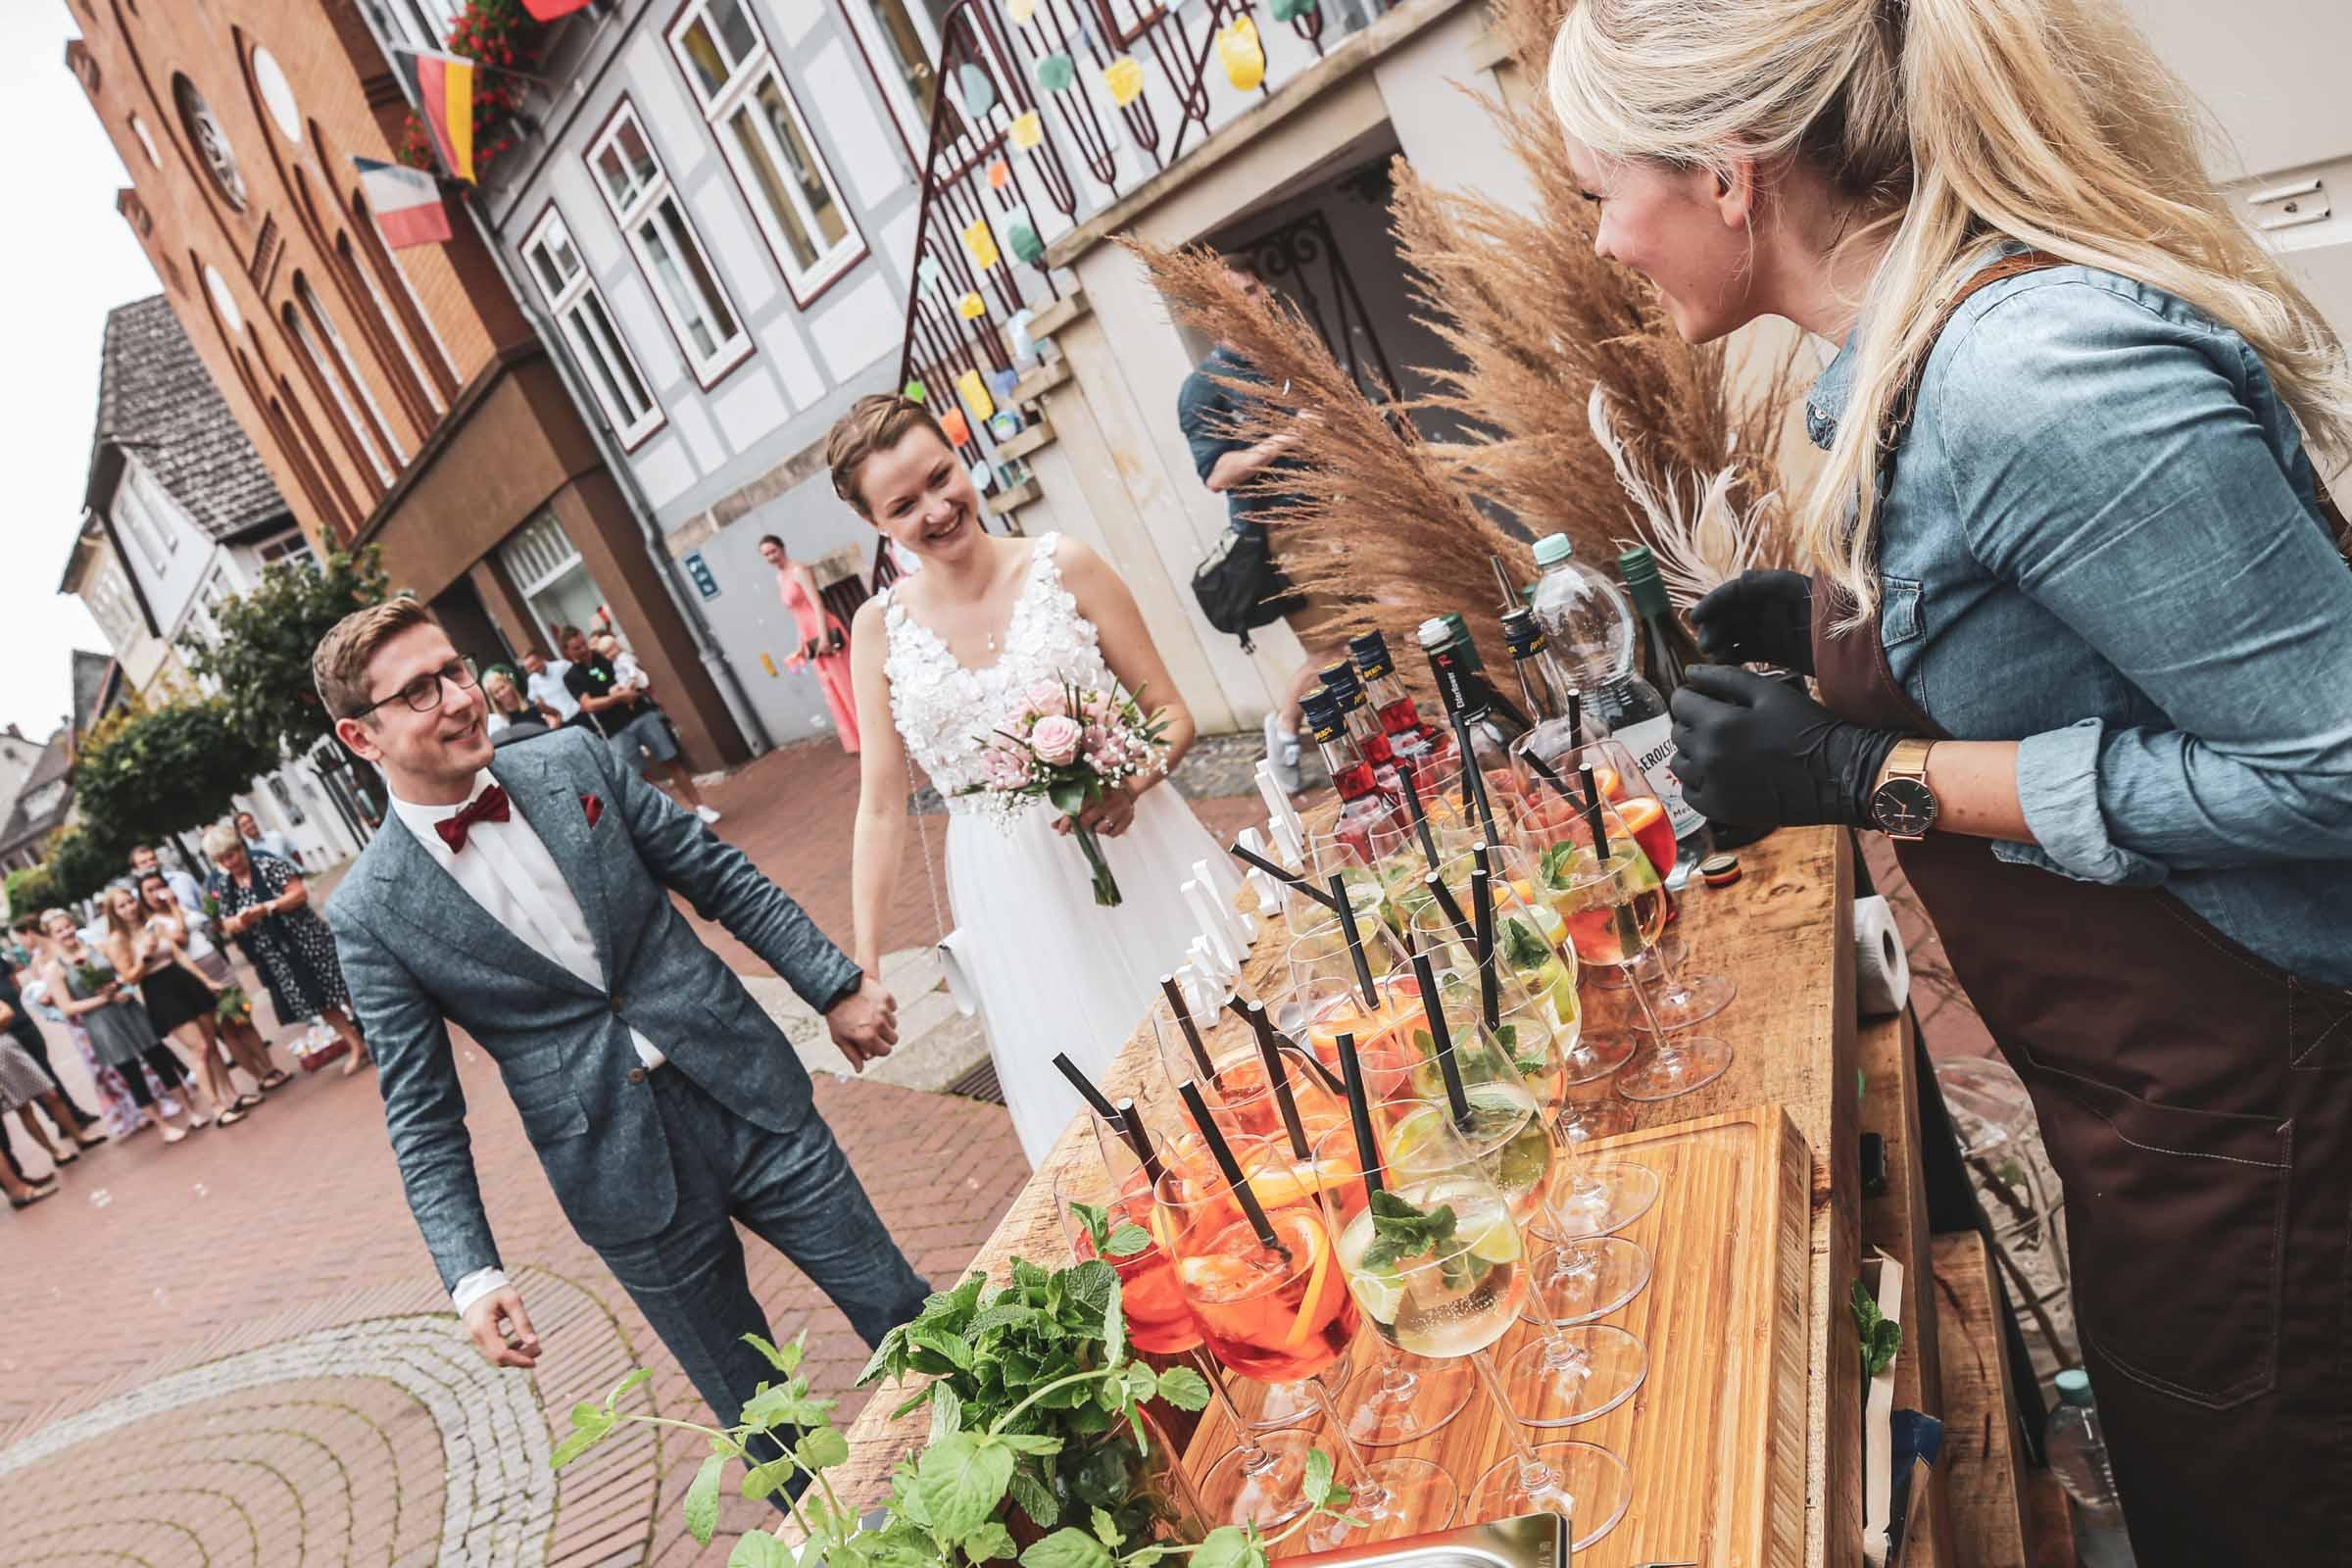 Cocktailservice | Hannover | Mobile | Bar | Bulli | VW | Barformat | Hochzeit | Tresen | Standesampt | Barkeeper | Getränke | Catering | Weinbar | Sektbar | Buchen | Mieten | Anfragen